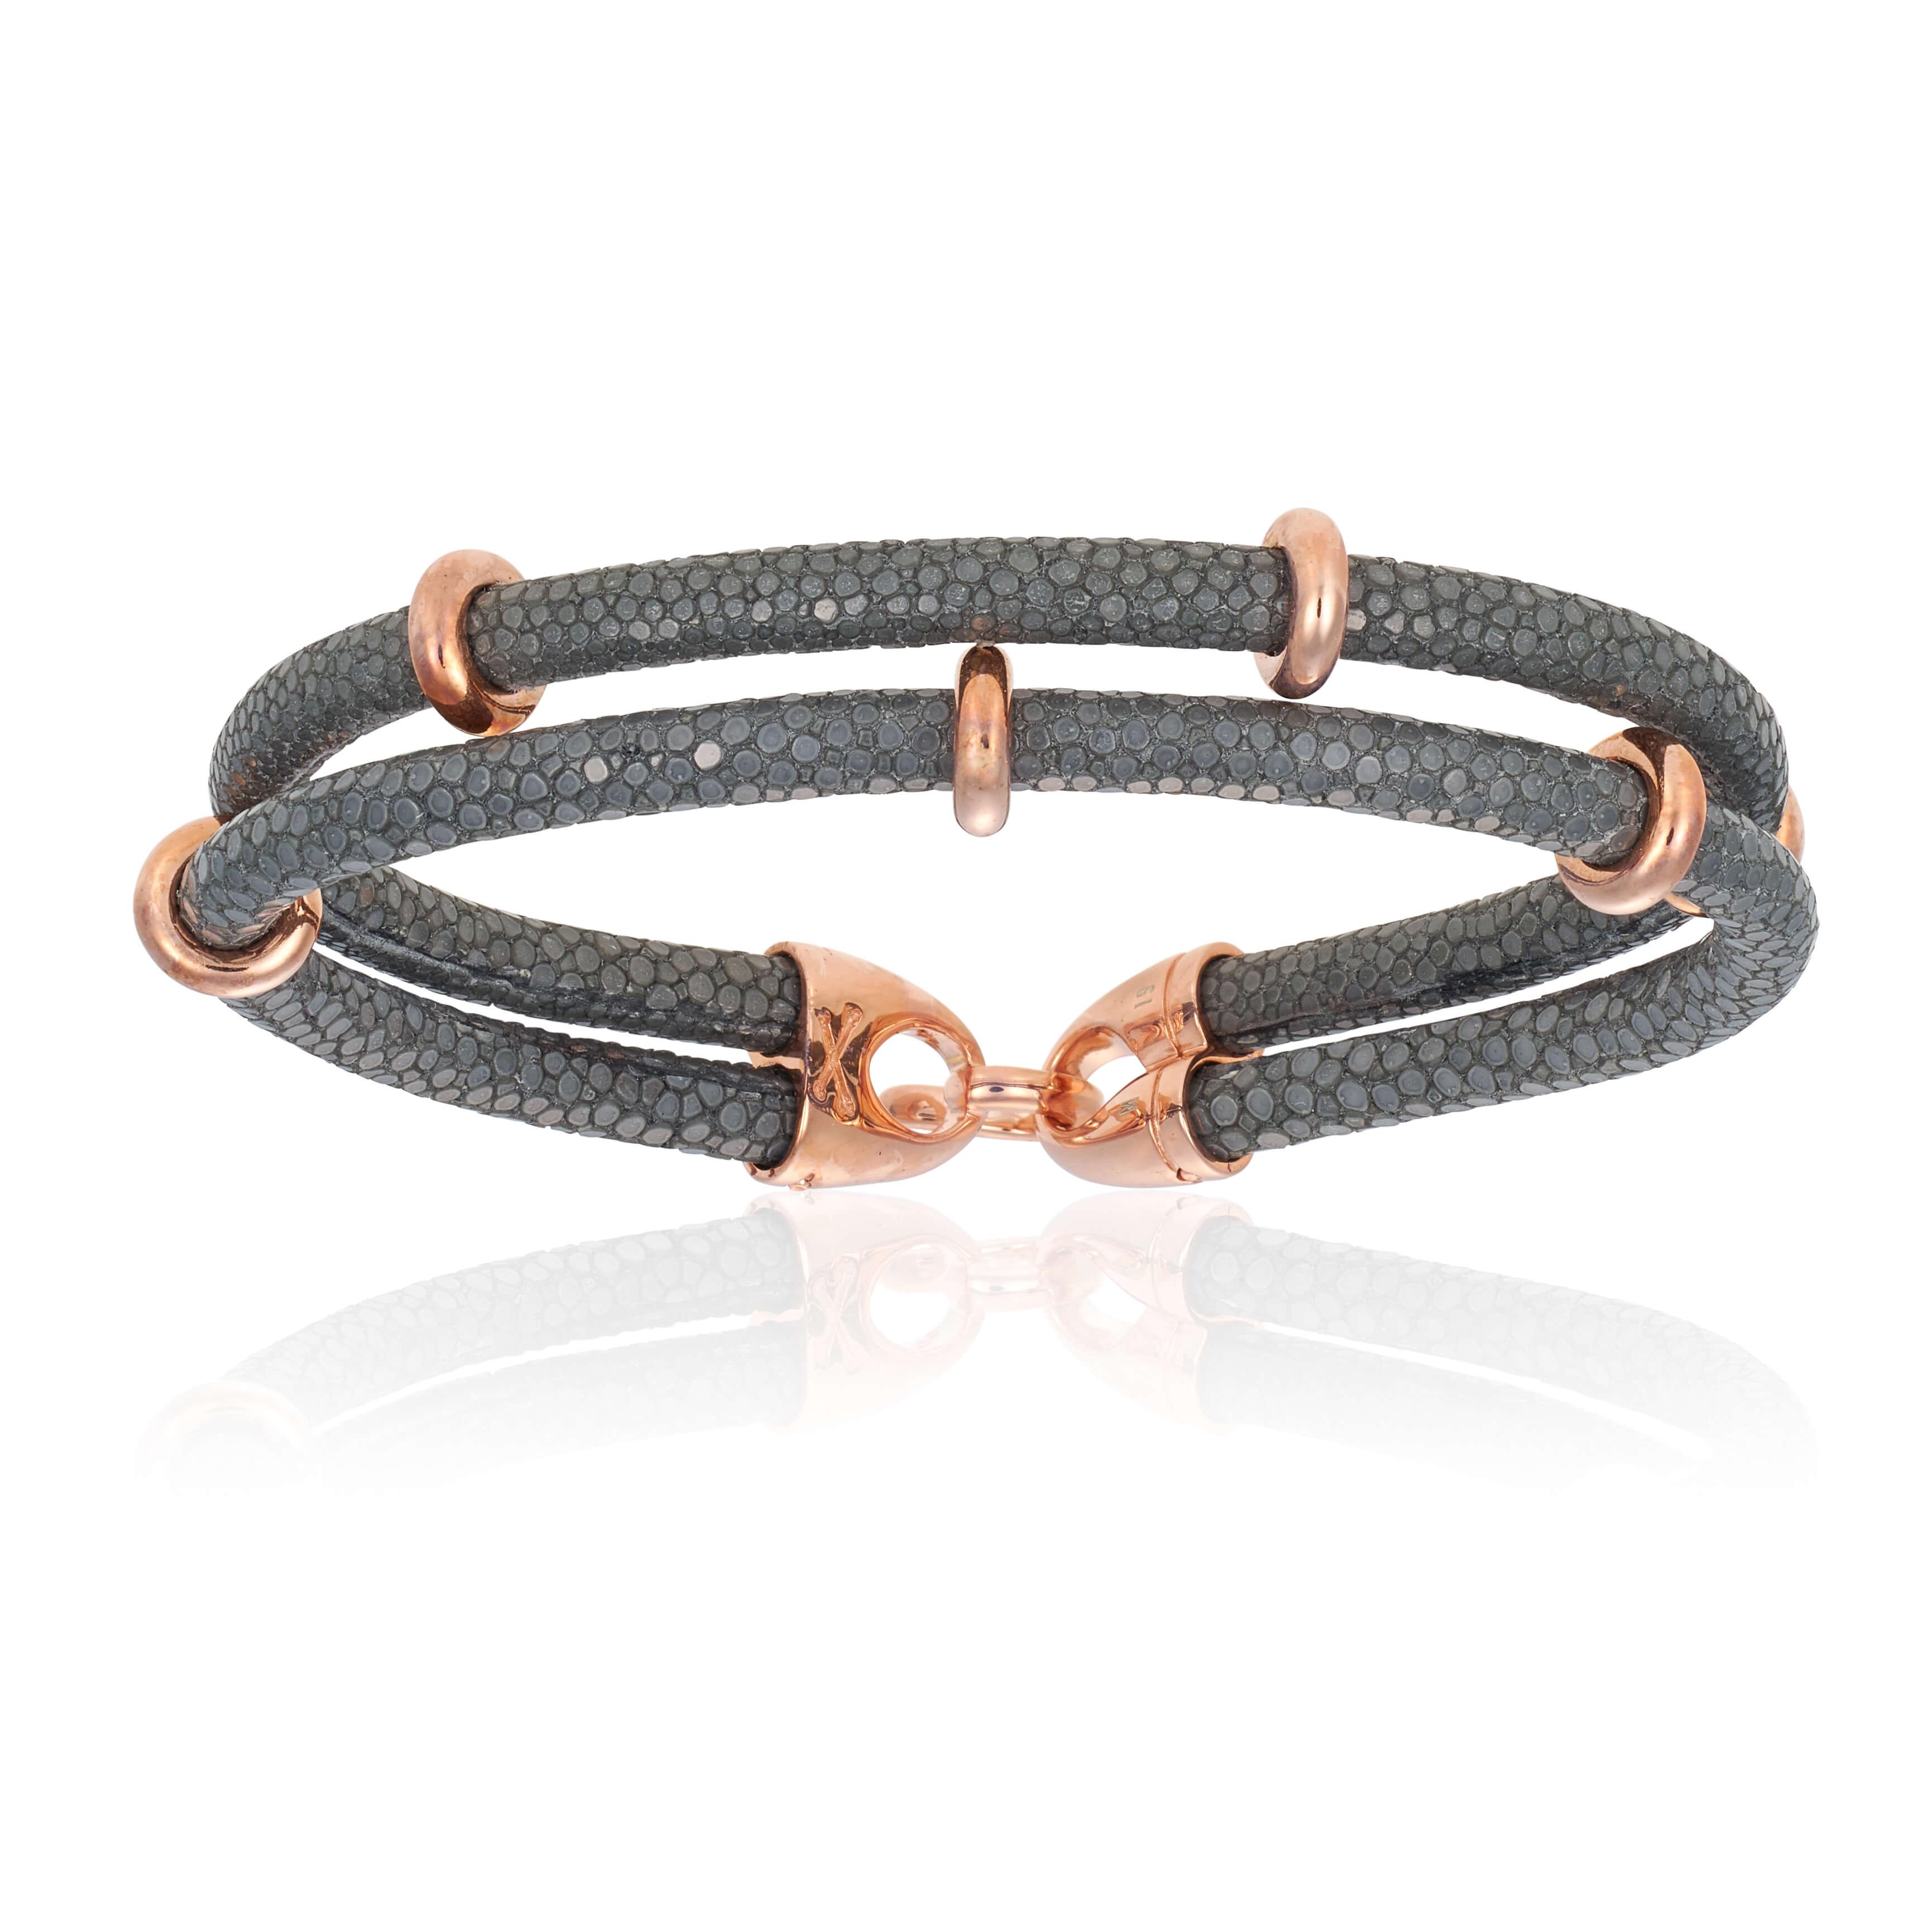 Gray stingray bracelet with rose gold beads (Unisex)